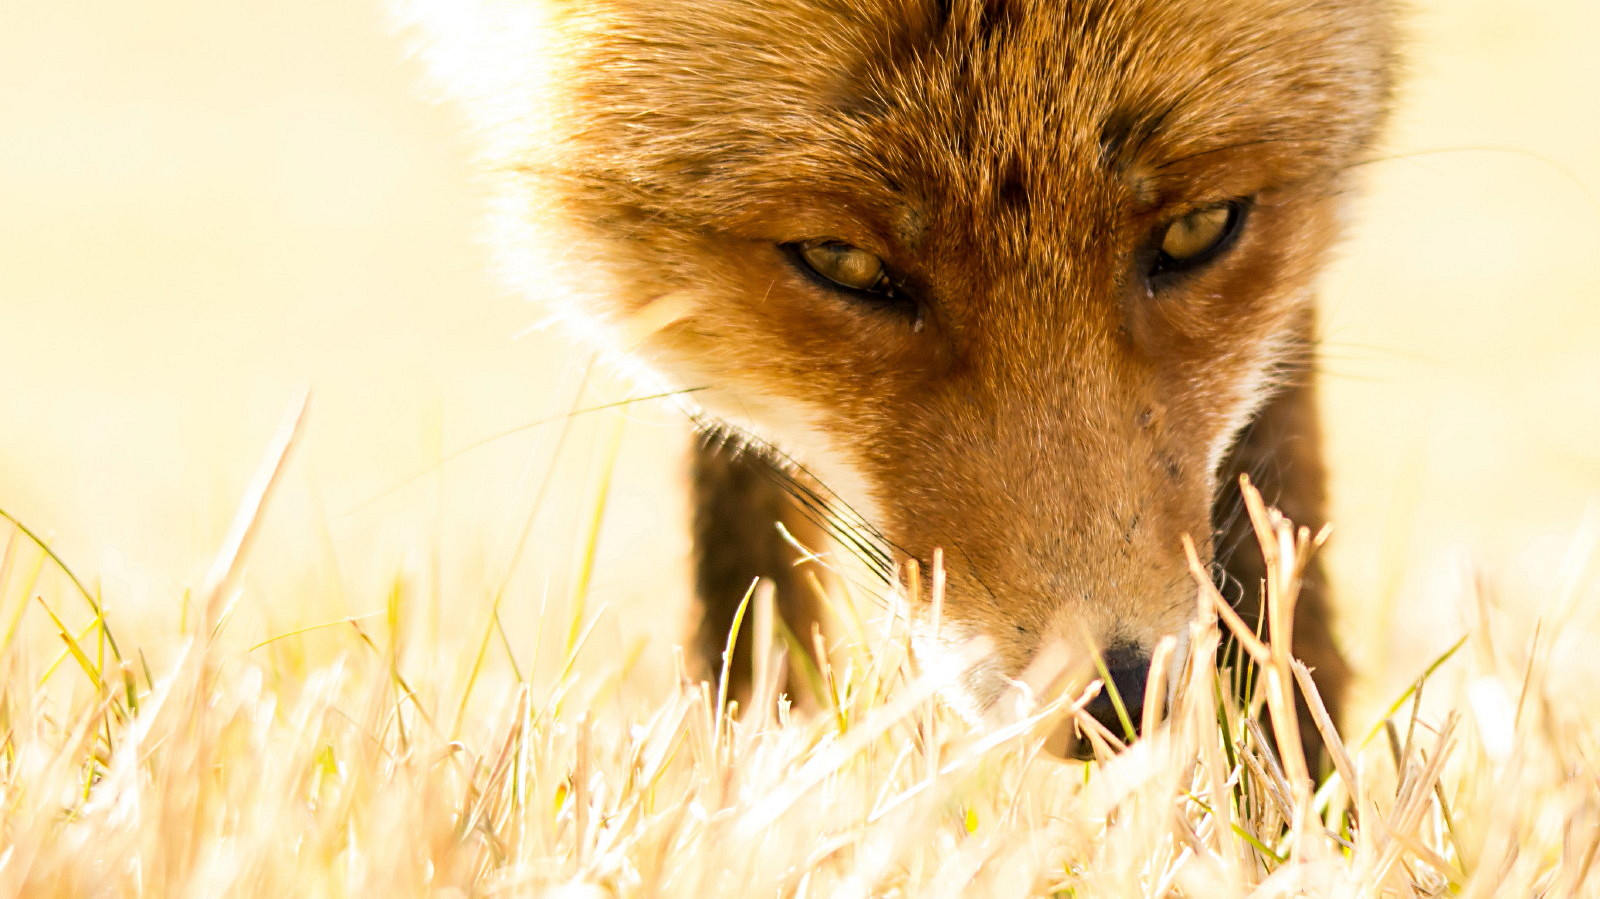 Fox as wallpaper for your desktop